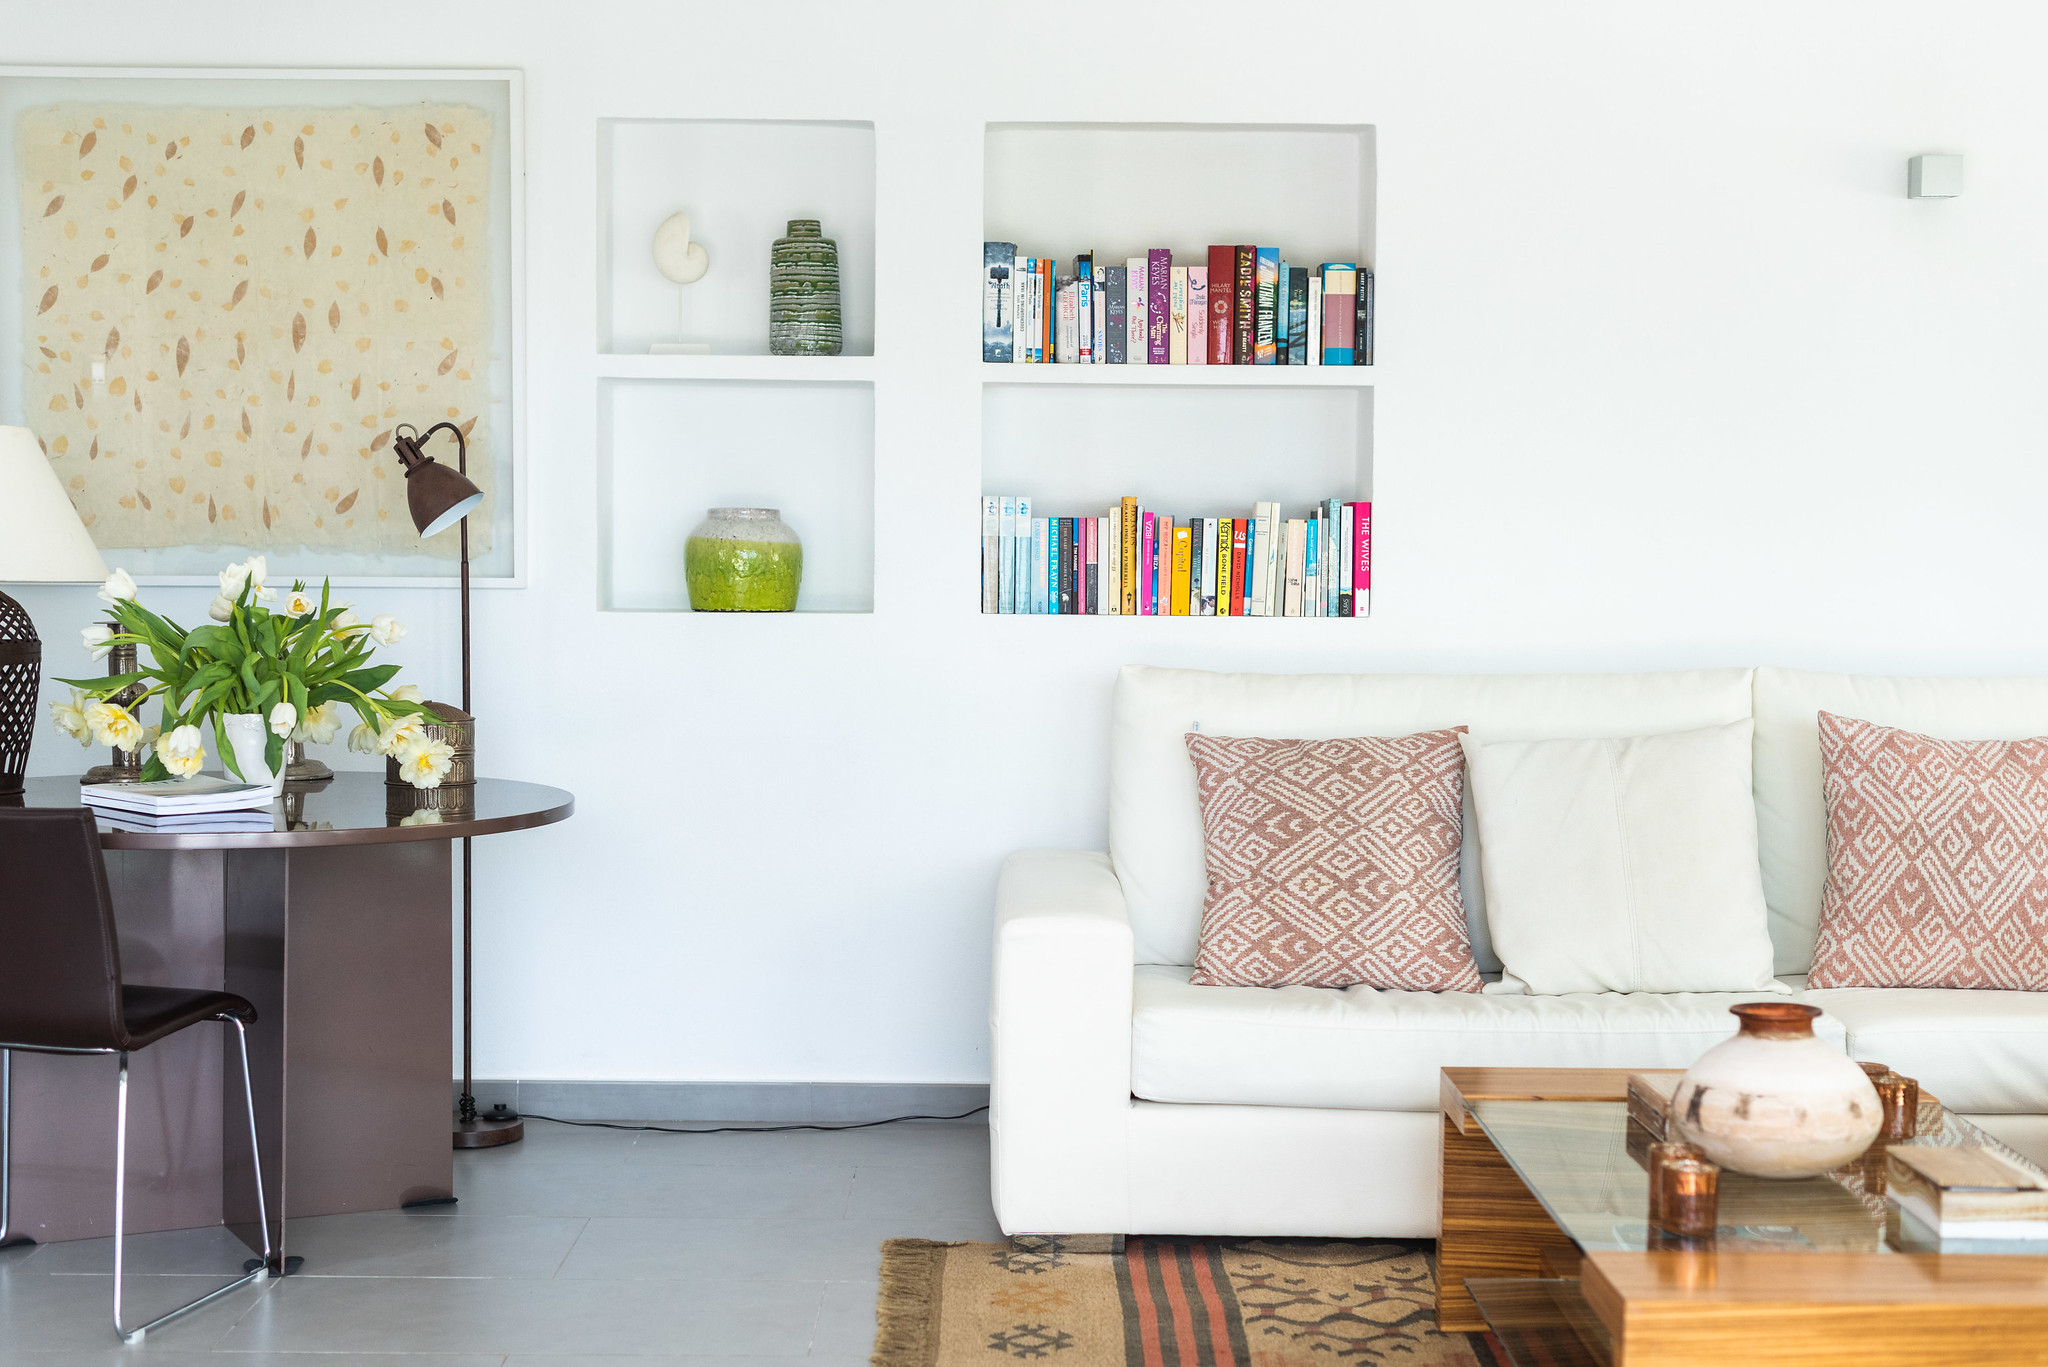 https://www.white-ibiza.com/wp-content/uploads/2020/06/white-ibiza-villas-villa-azul-interior-living-room.jpg